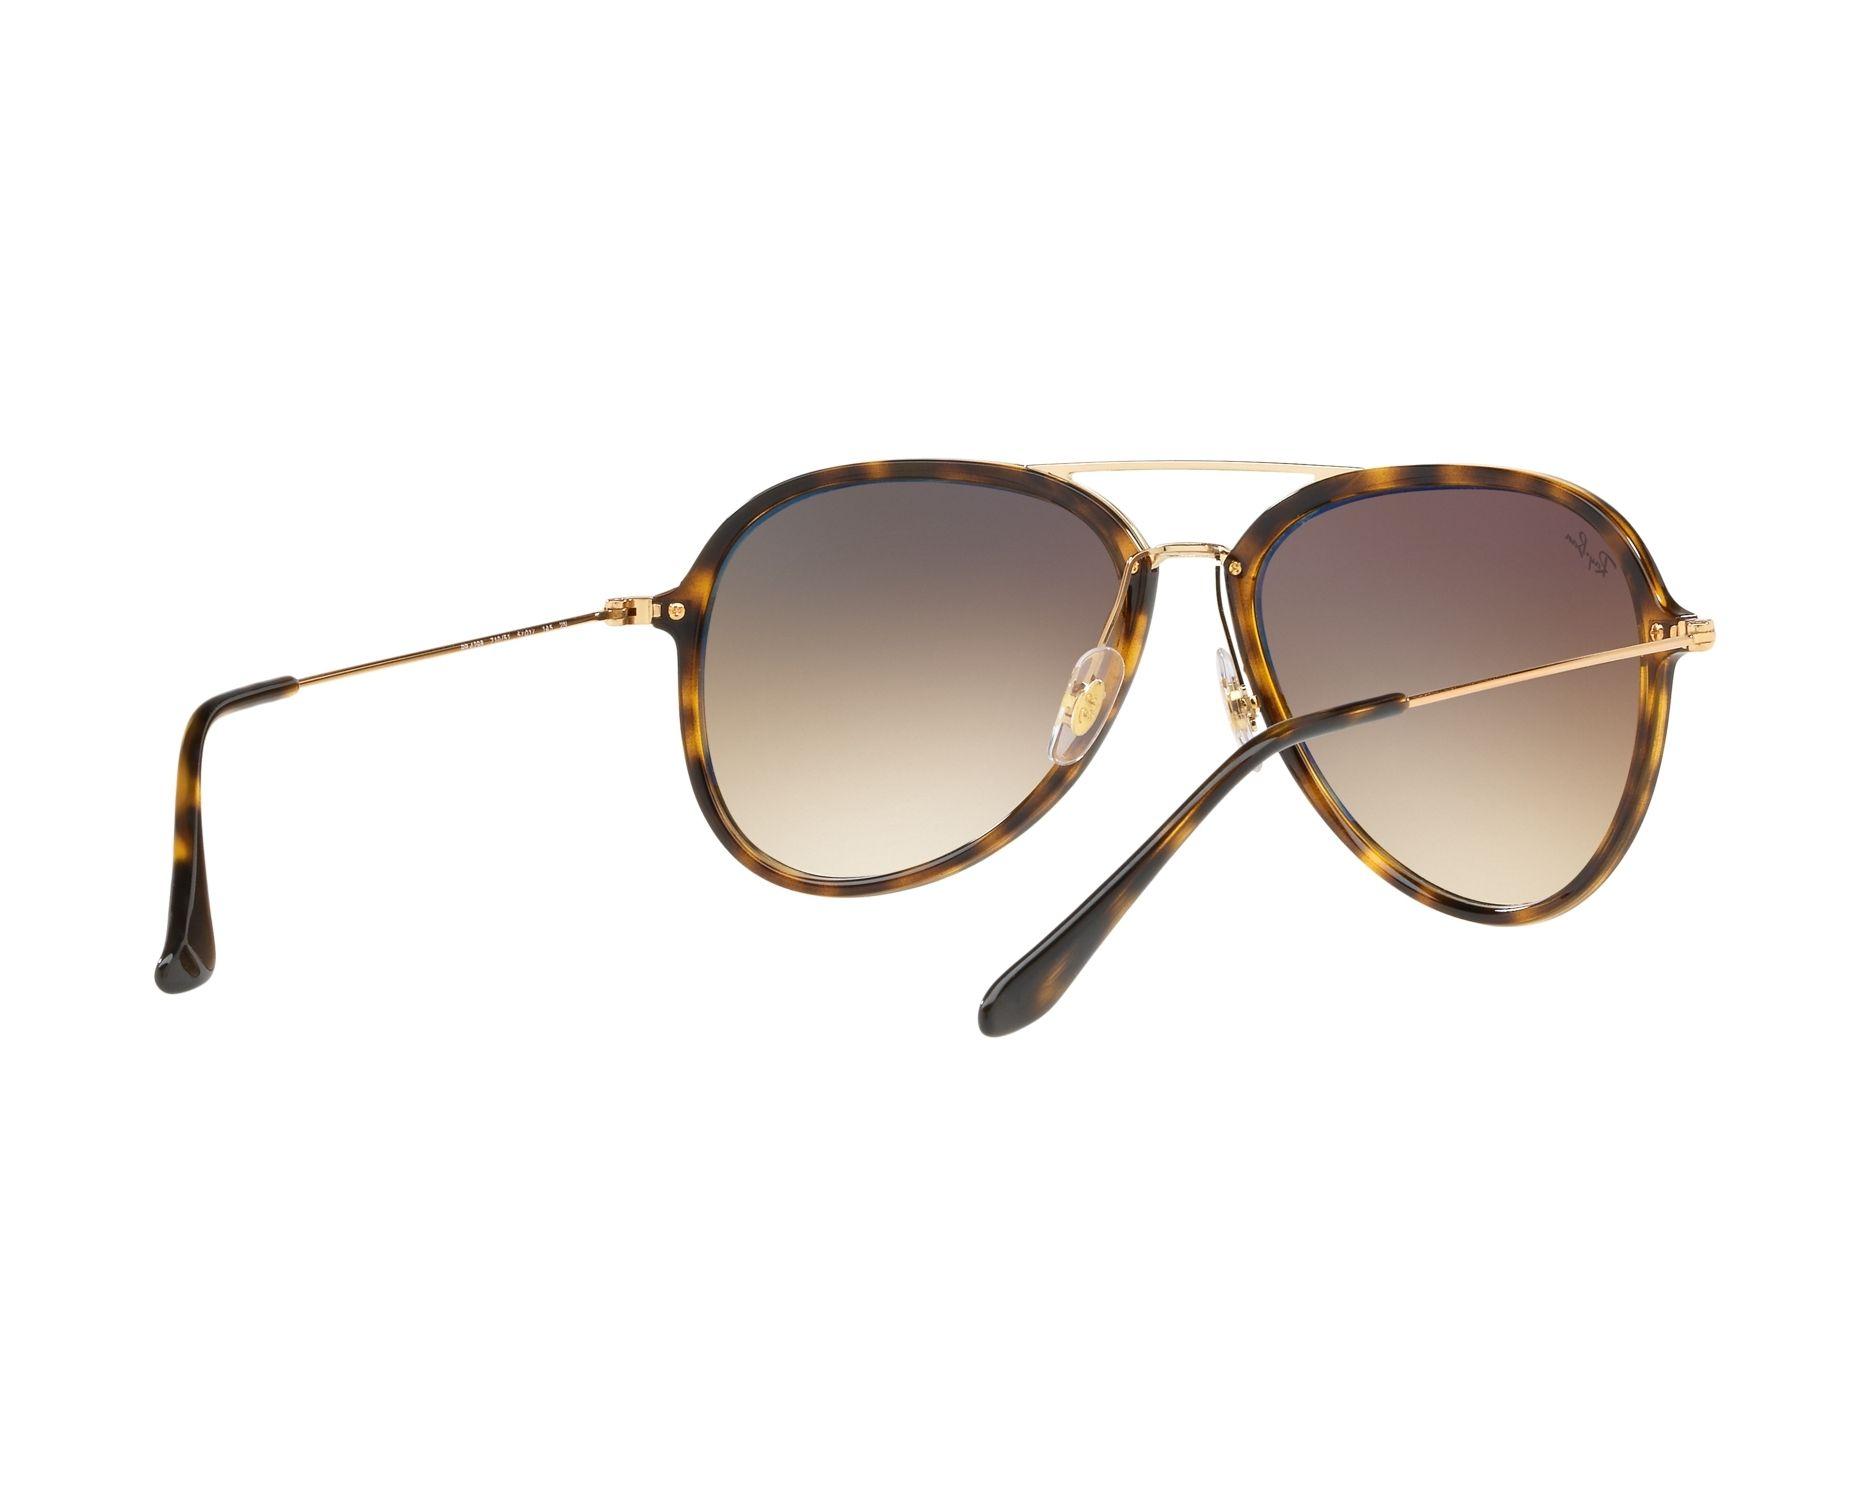 a677e92b968 Sunglasses Ray-Ban RB-4298 710 51 57-17 Havana Gold 360